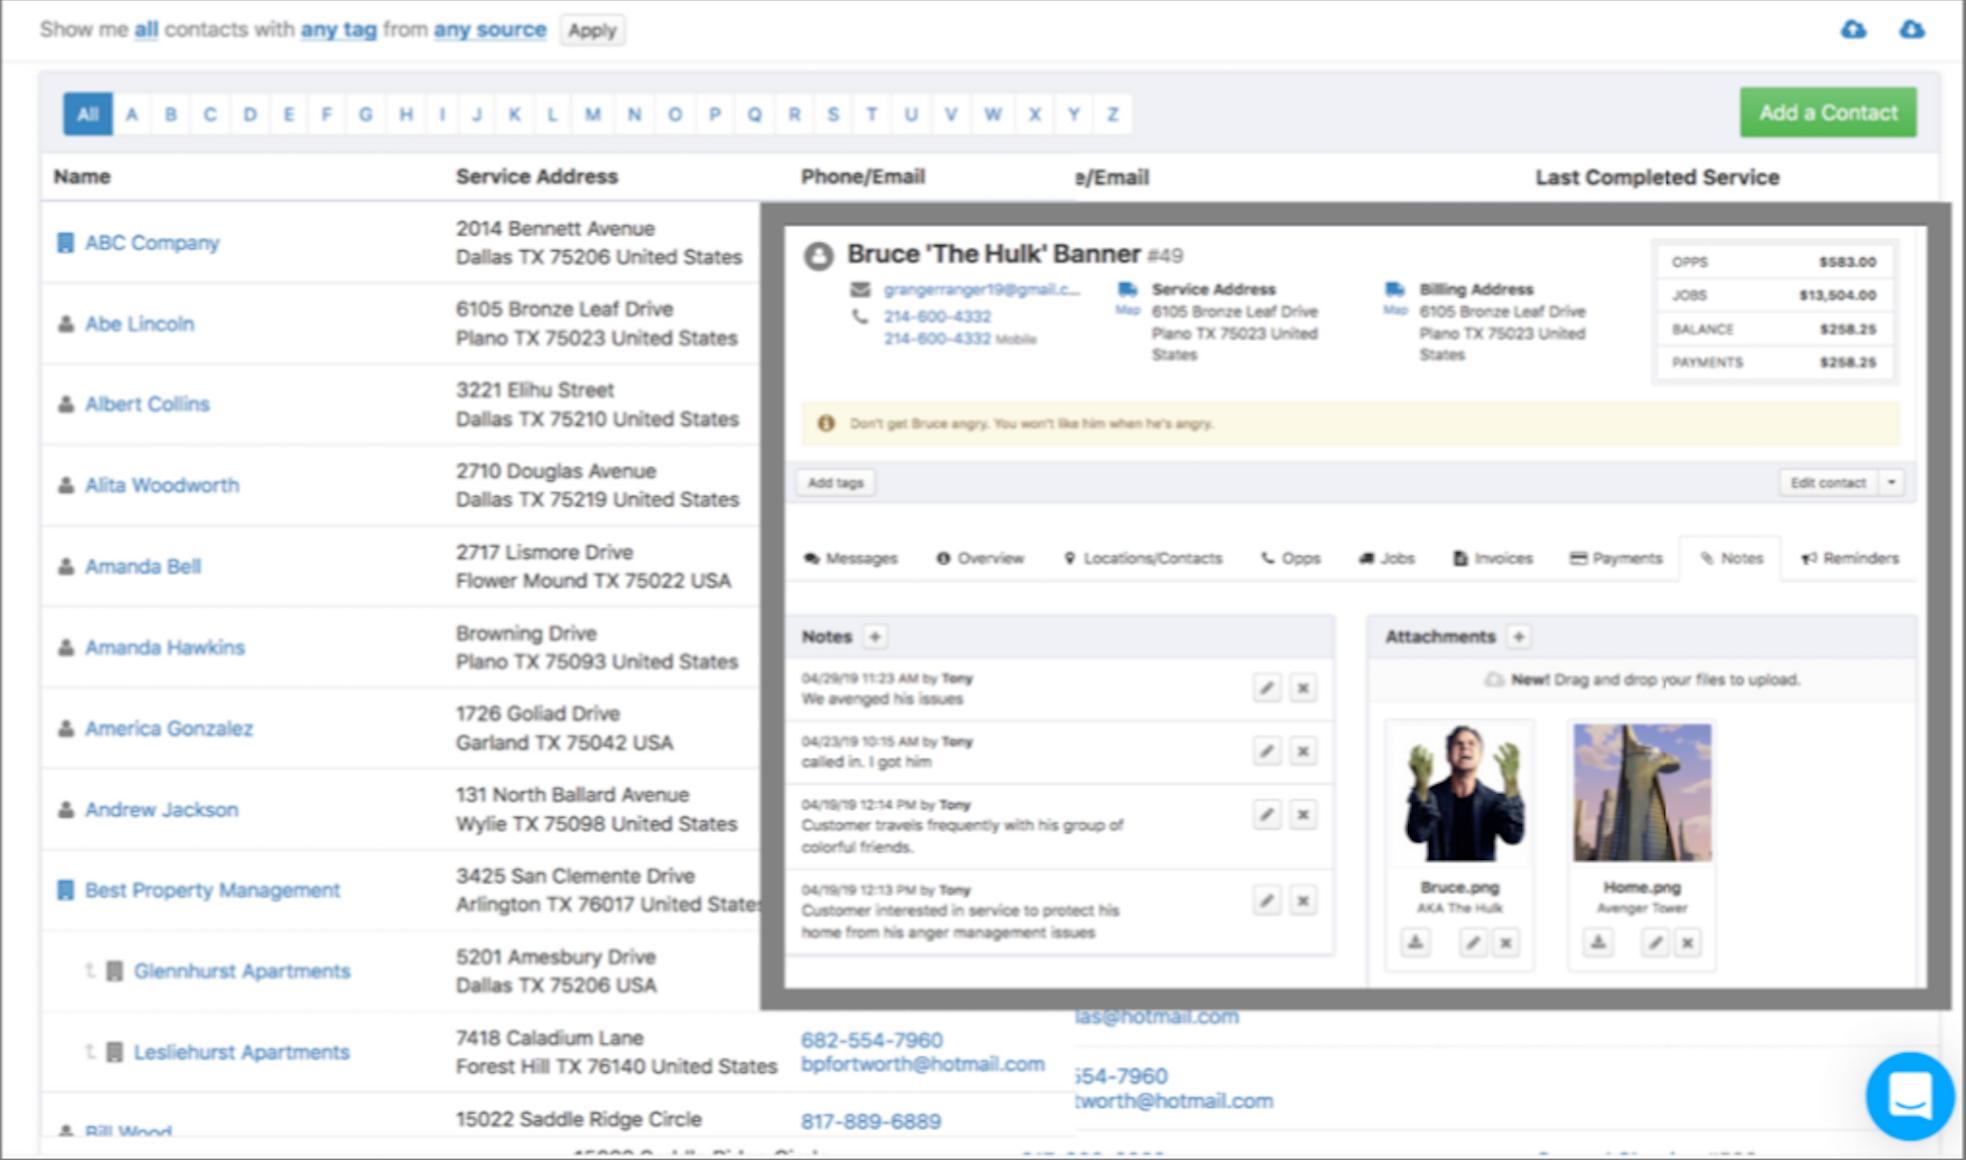 Kickserv Software - Customer management